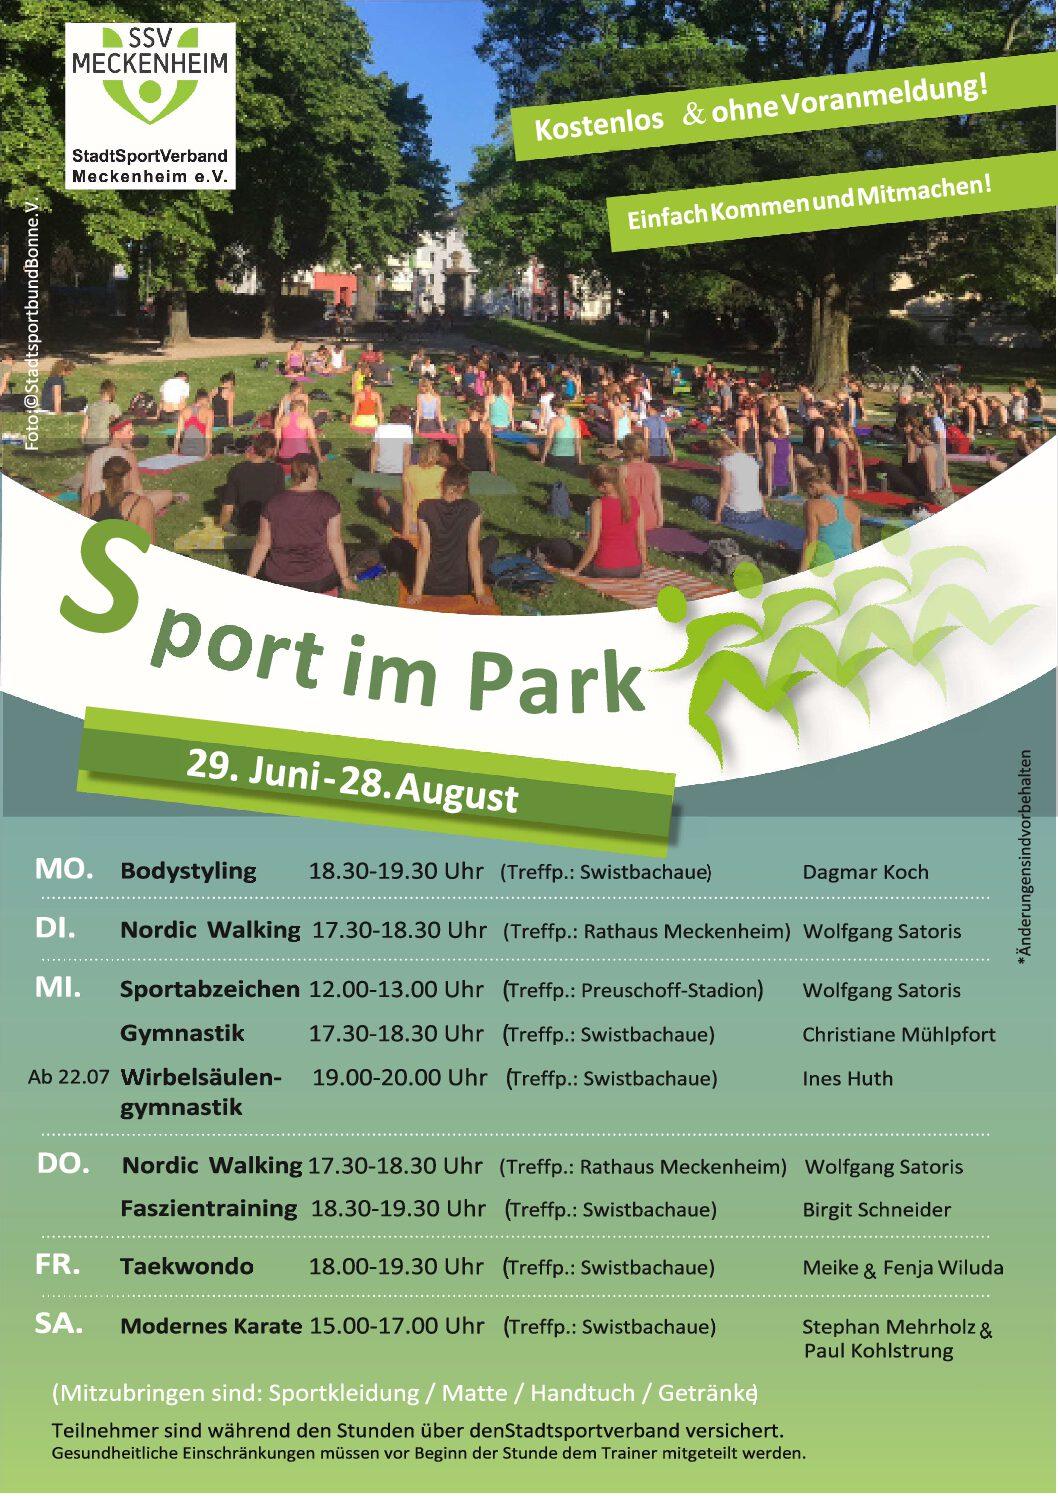 Sport im Park 29.06.-28.08.